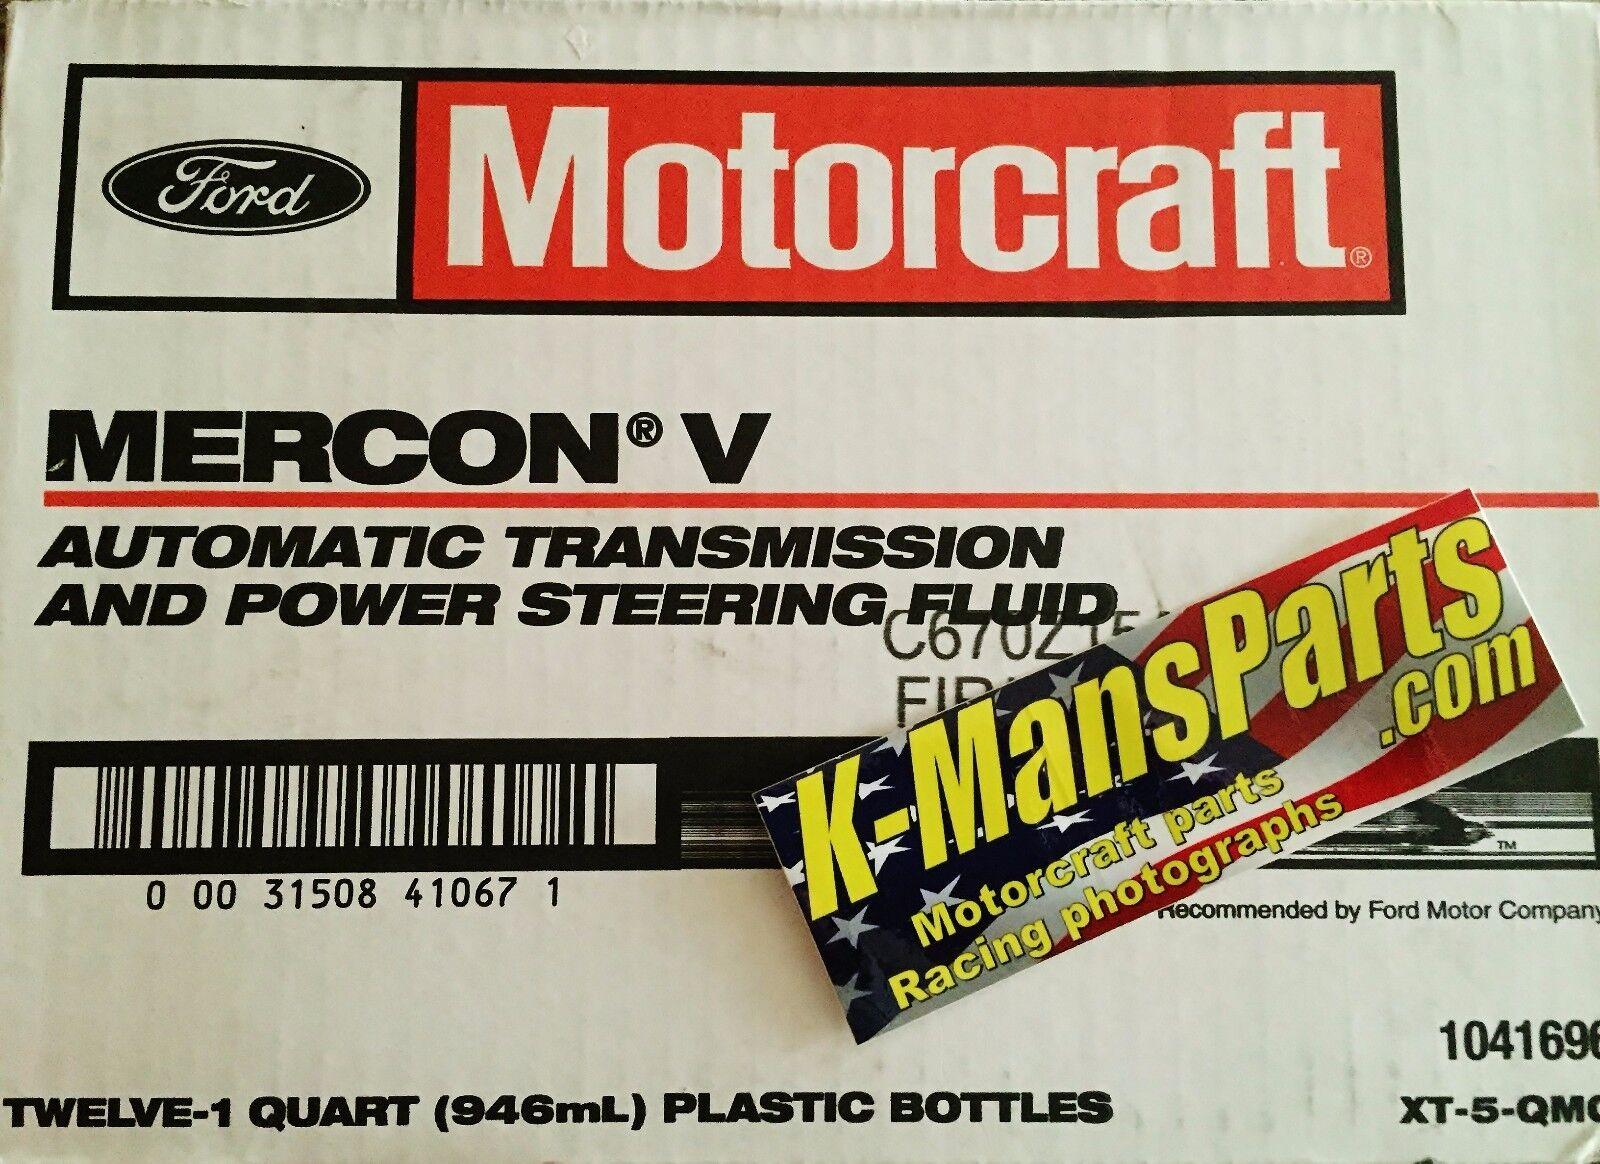 Mercon V: 10 Quarts Of Ford Motocraft Mercon V Mercon LV Automatic